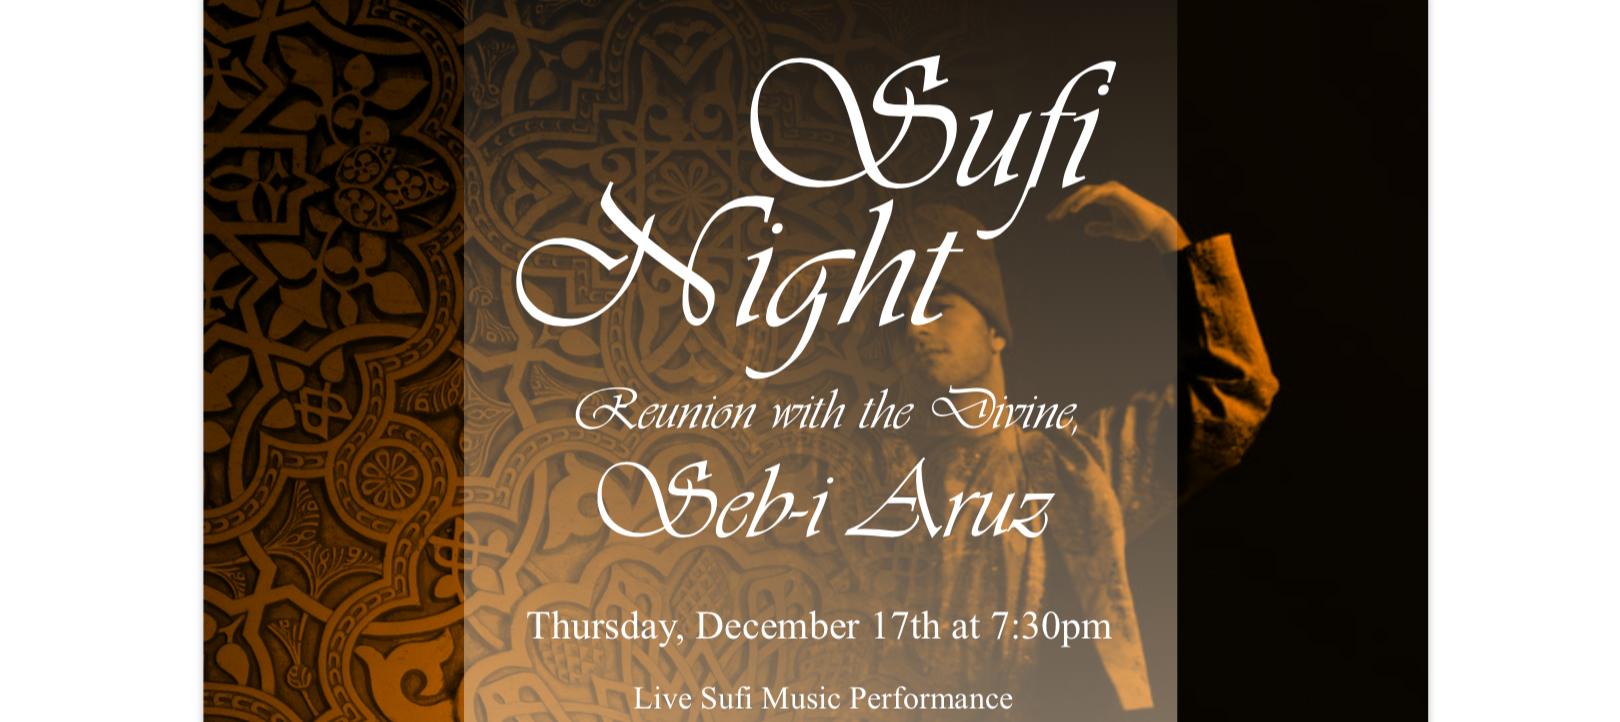 Sufi Night: Reunion with the Divine, Seb-i Aruz